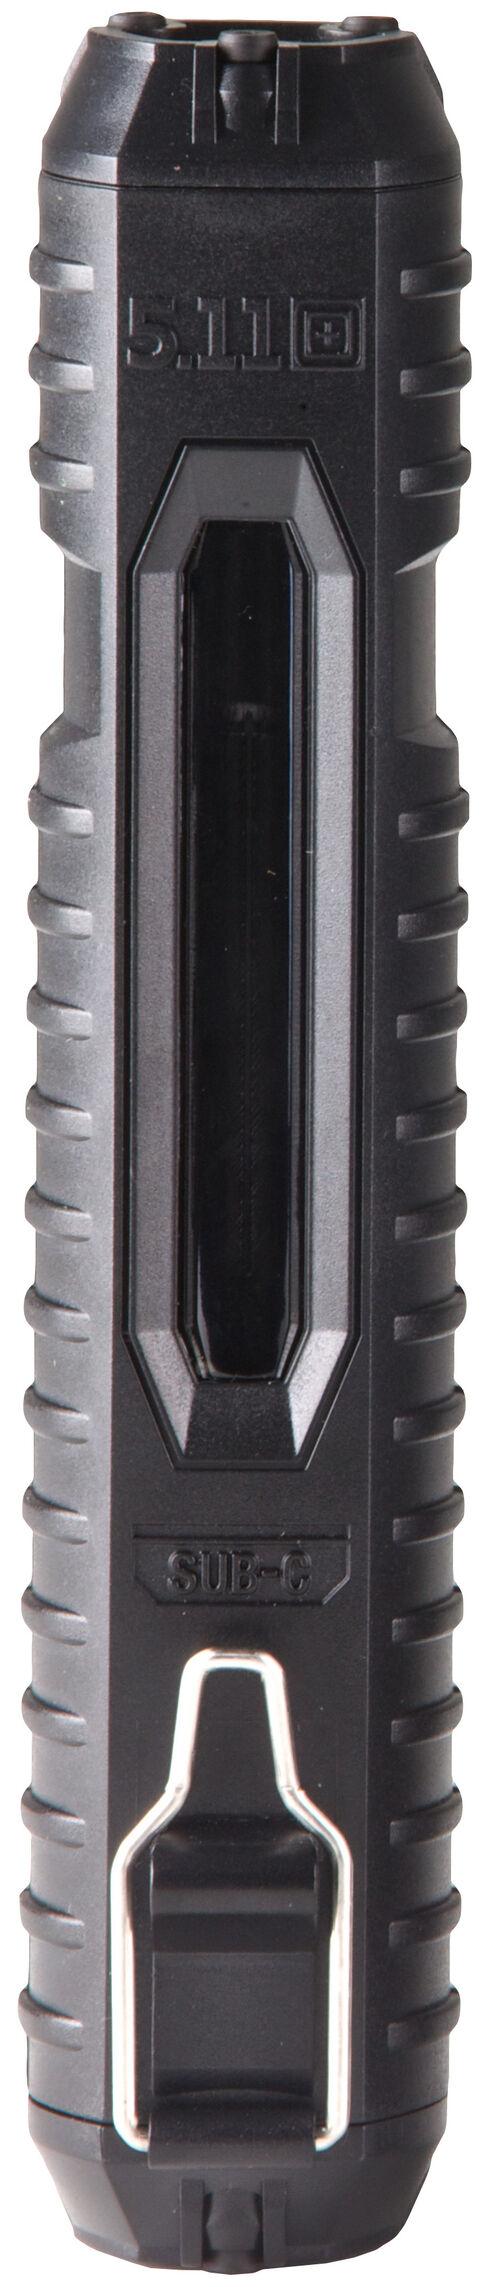 5.11 Tactical Battery Charging Holder - Sub C, Black, hi-res